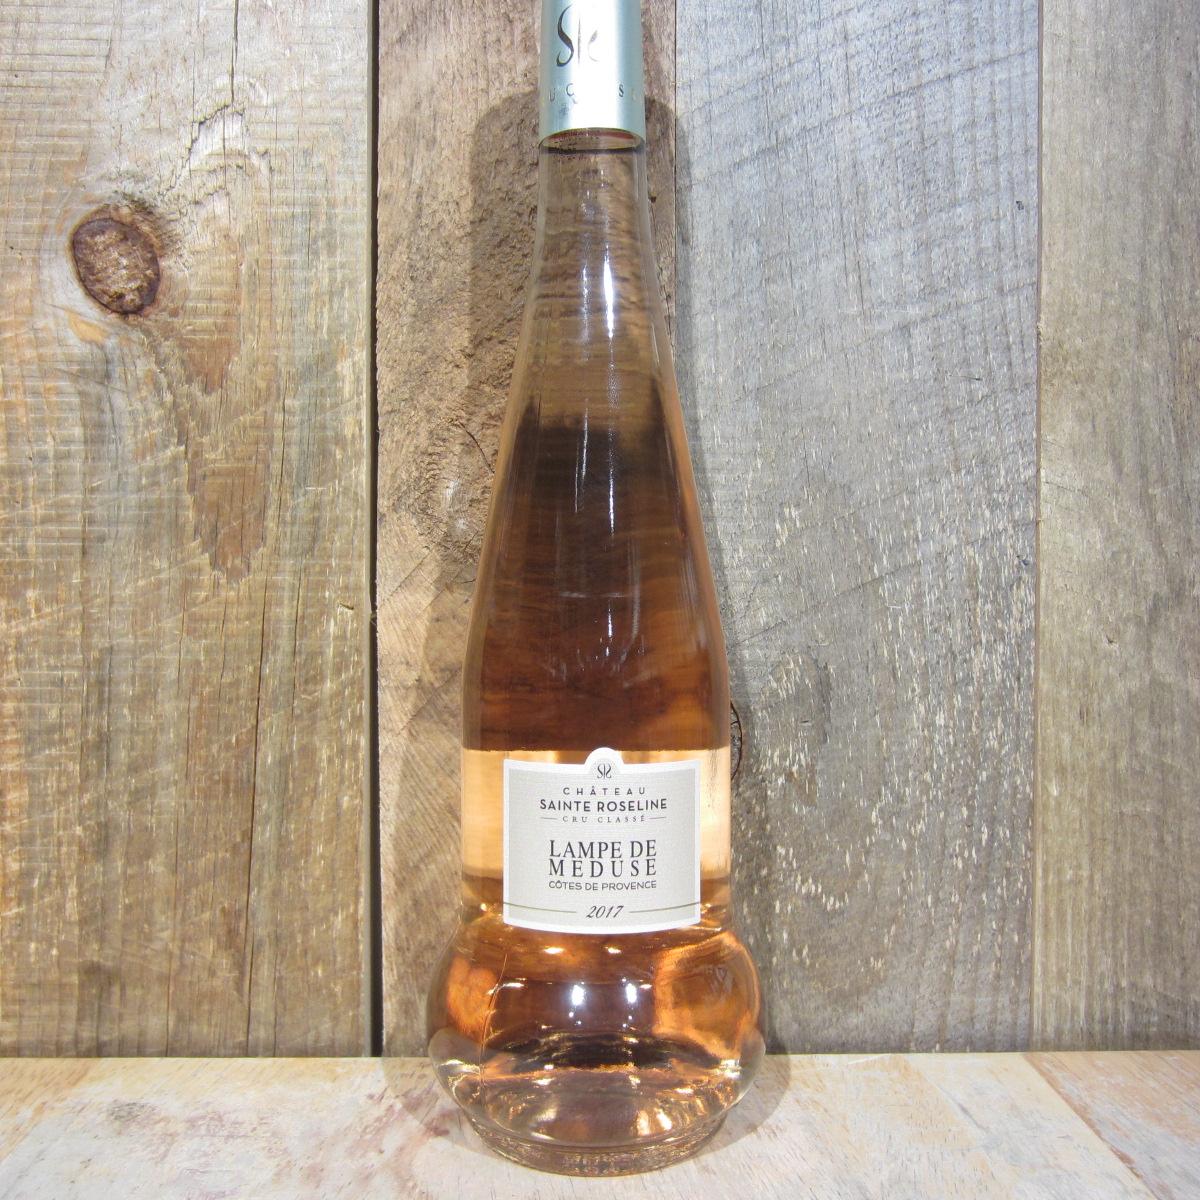 Chateau Sainte Roseline Lampe de Meduse Provence Rose 2020 750ml